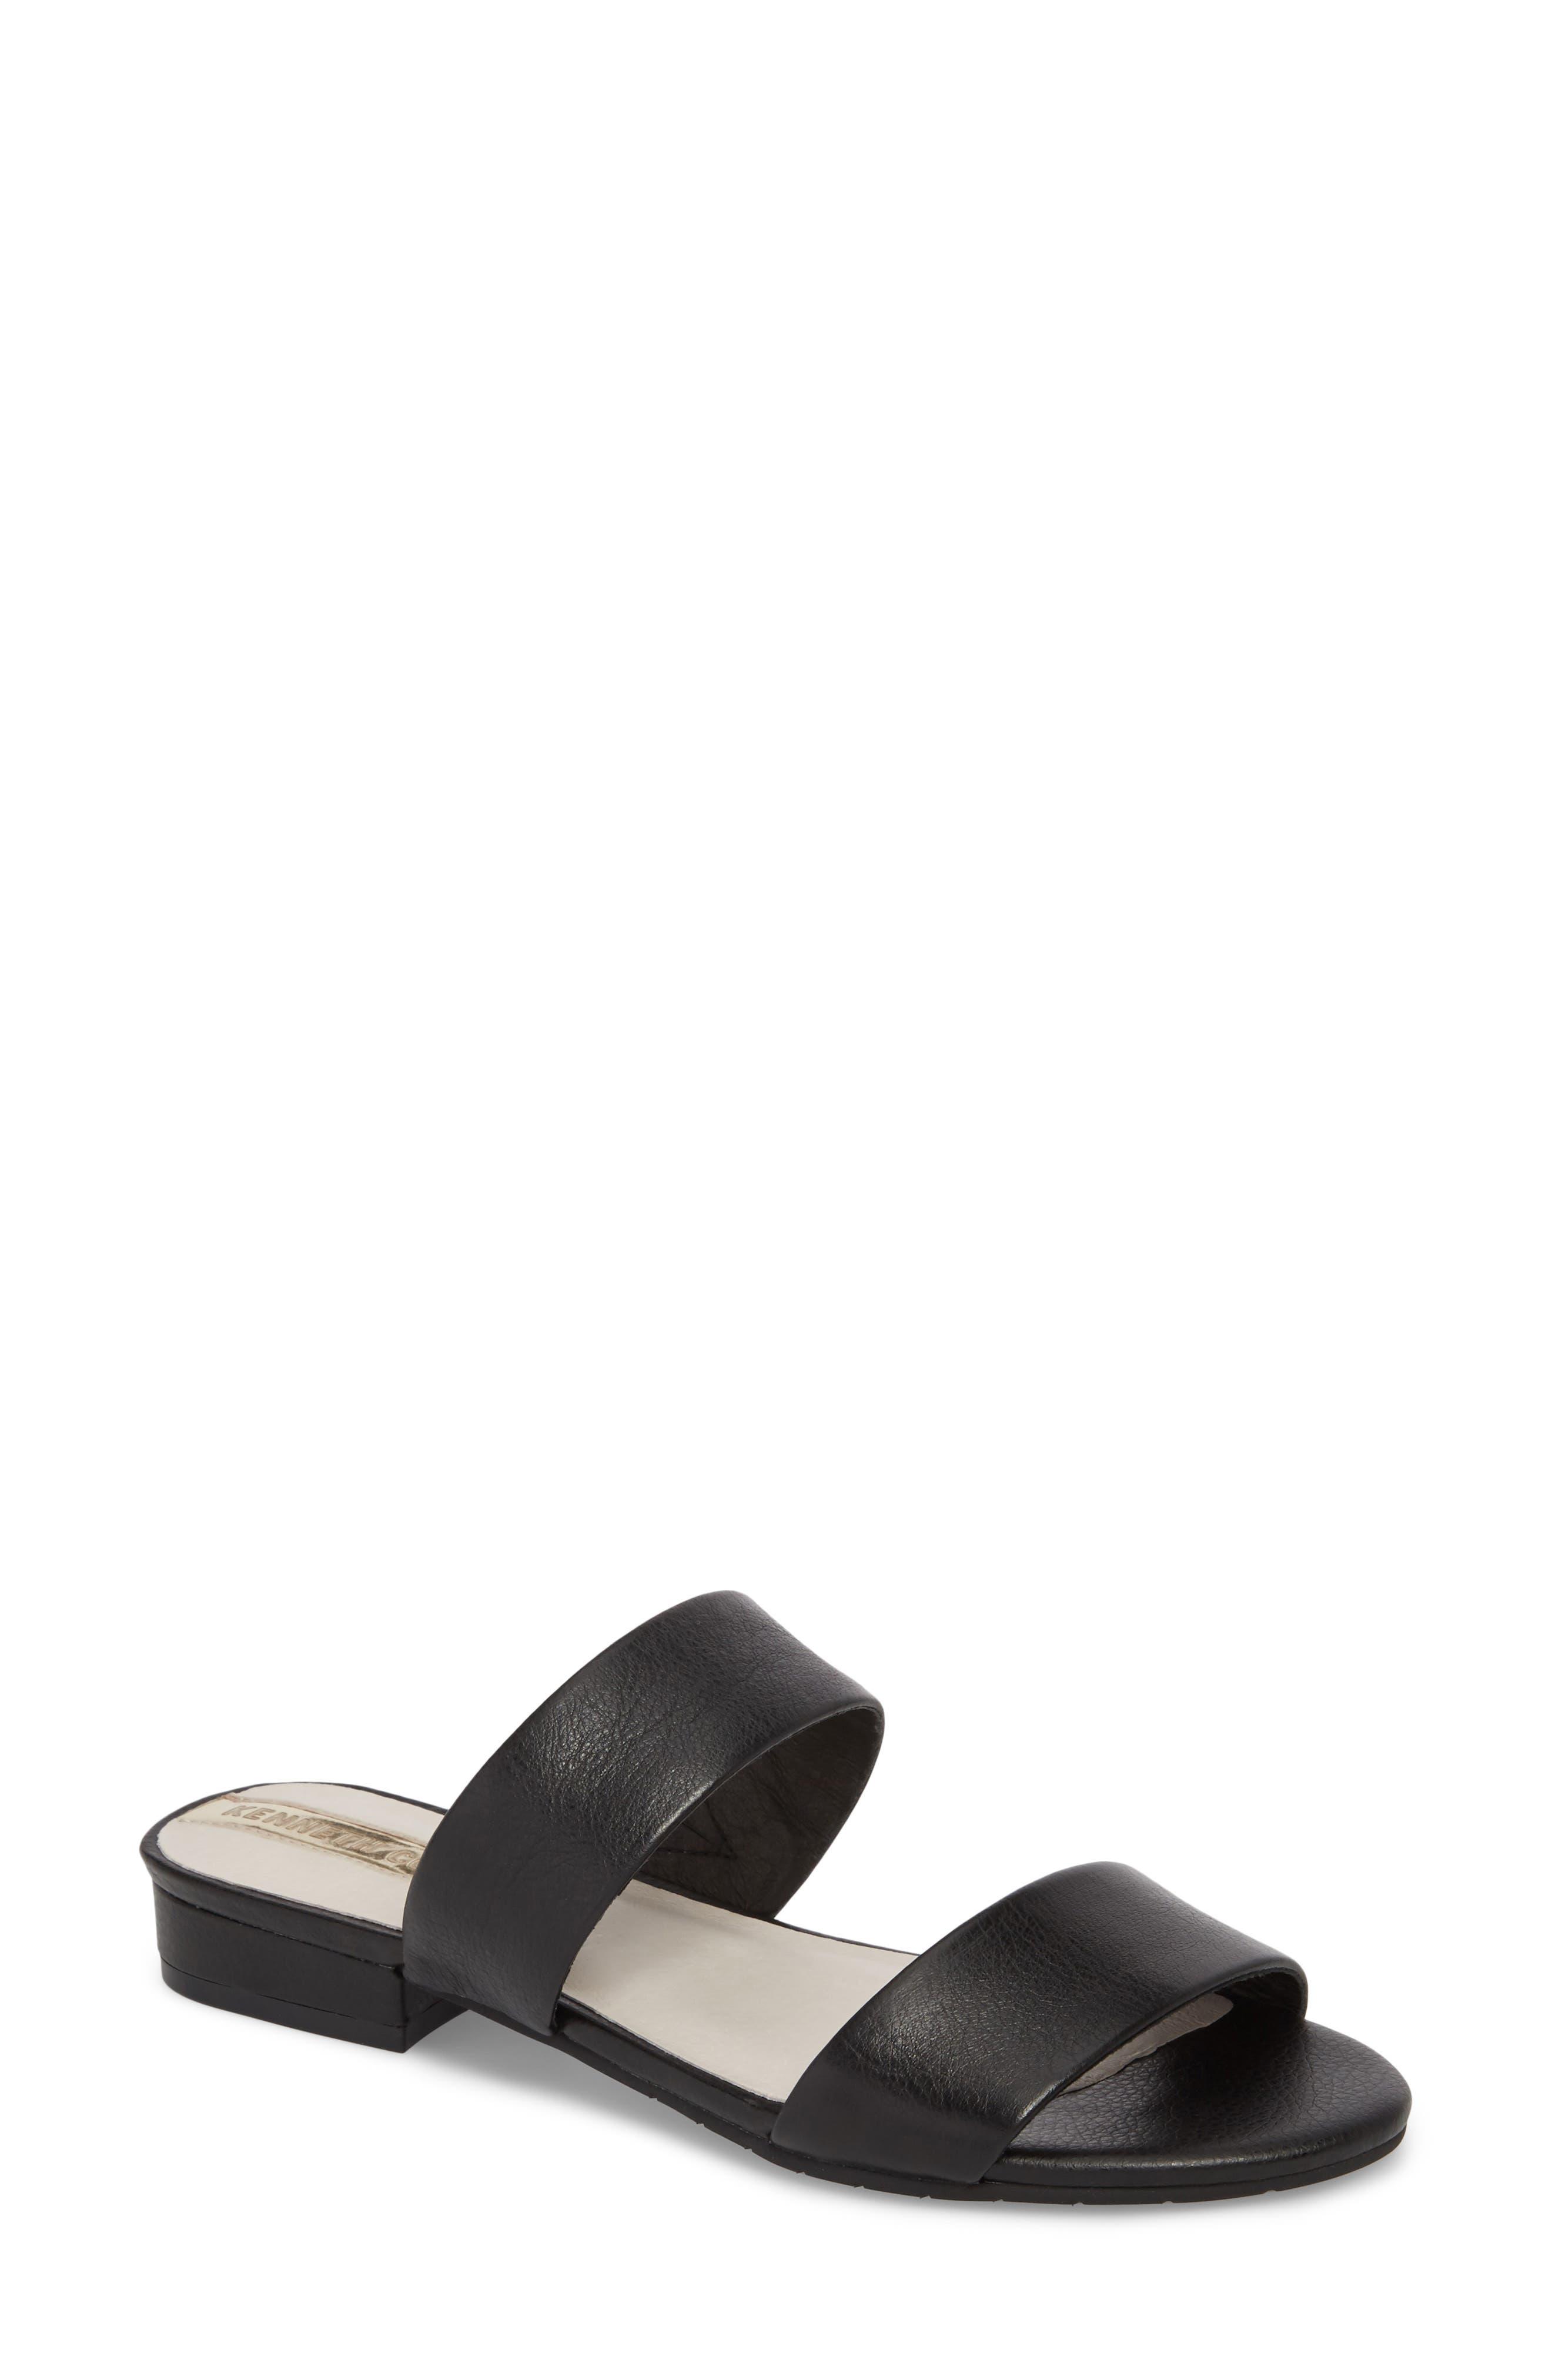 Viola Sandal,                             Main thumbnail 1, color,                             Black Leather